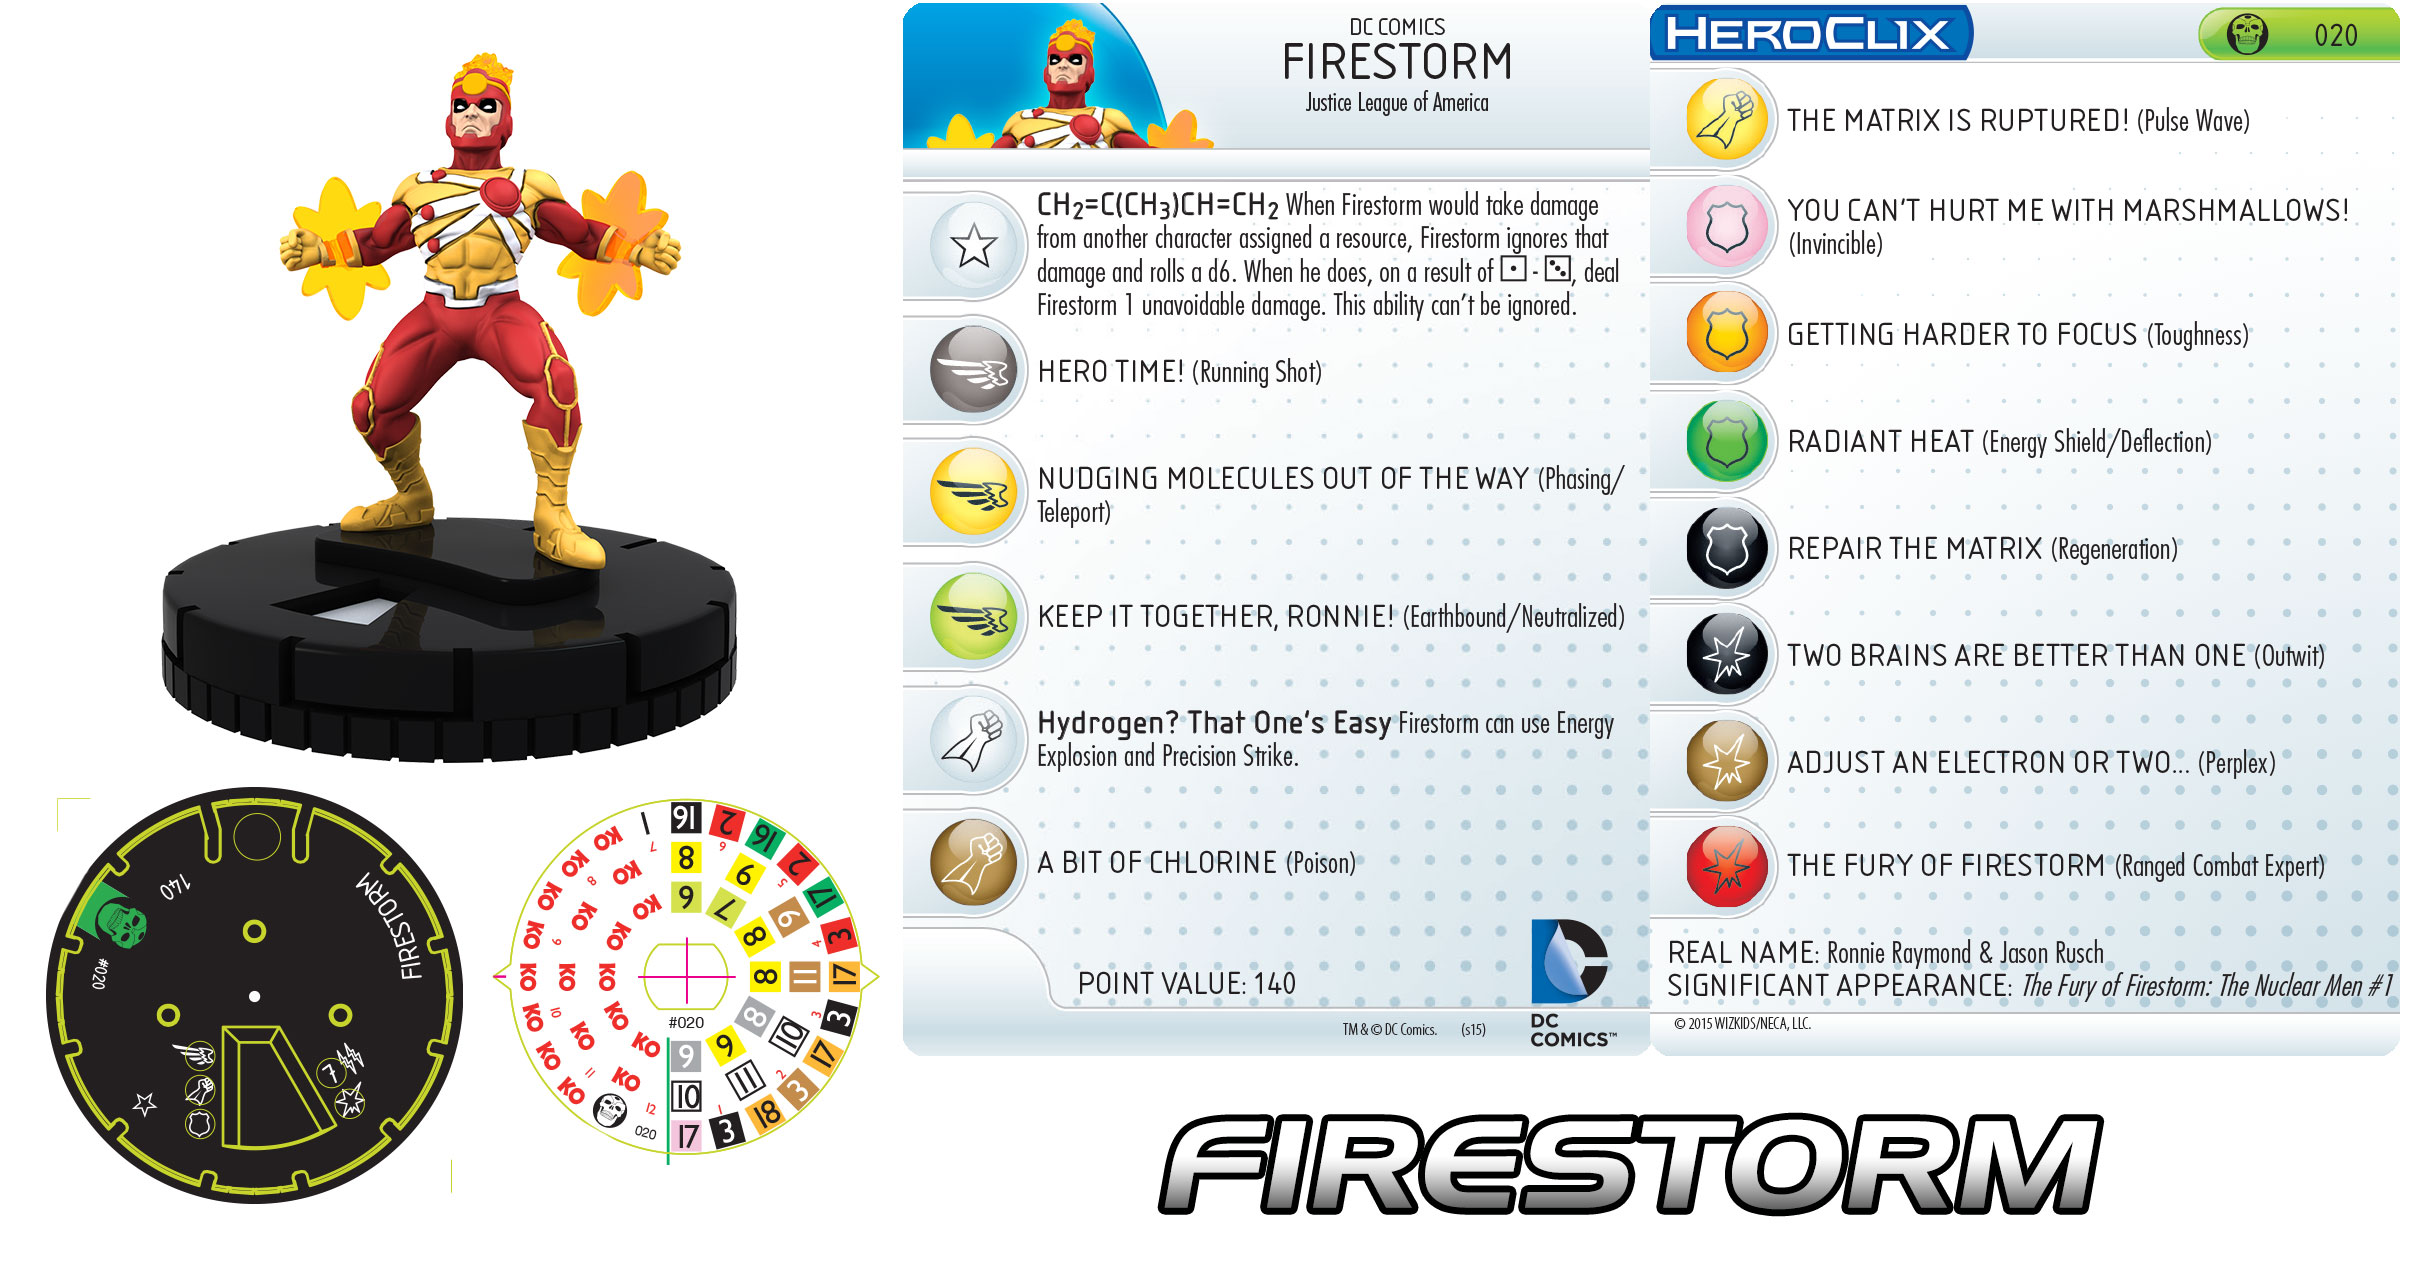 heroclix-firestorm.jpg